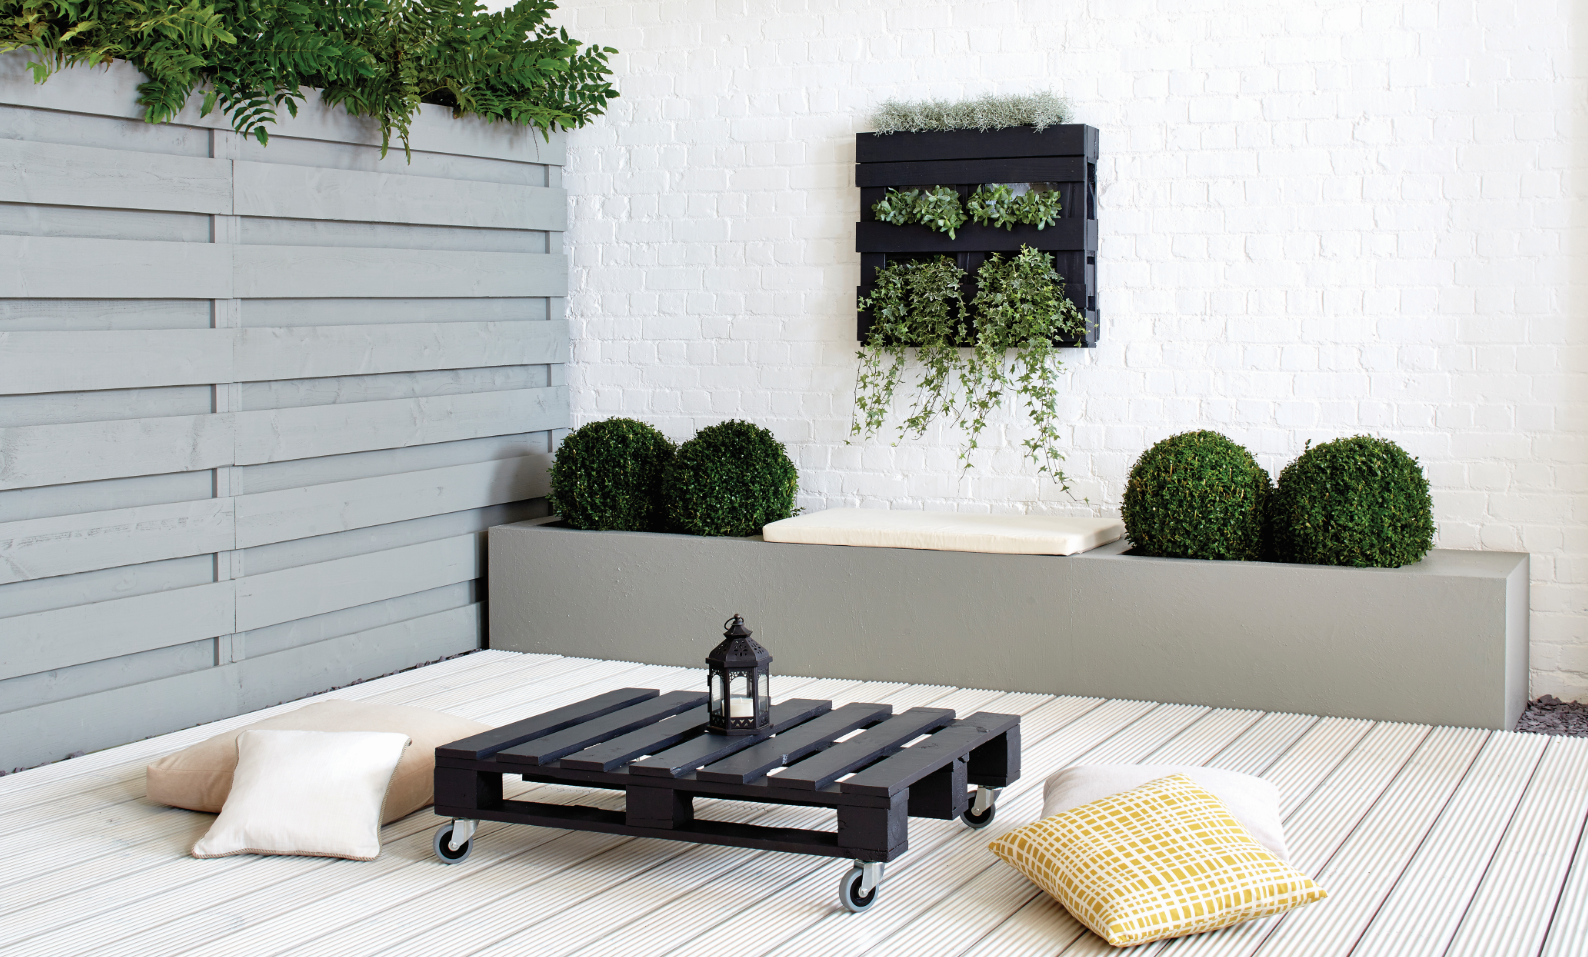 Ronseal Garden Paint: Daisy Slate Blackbird   Ideas for the House ...